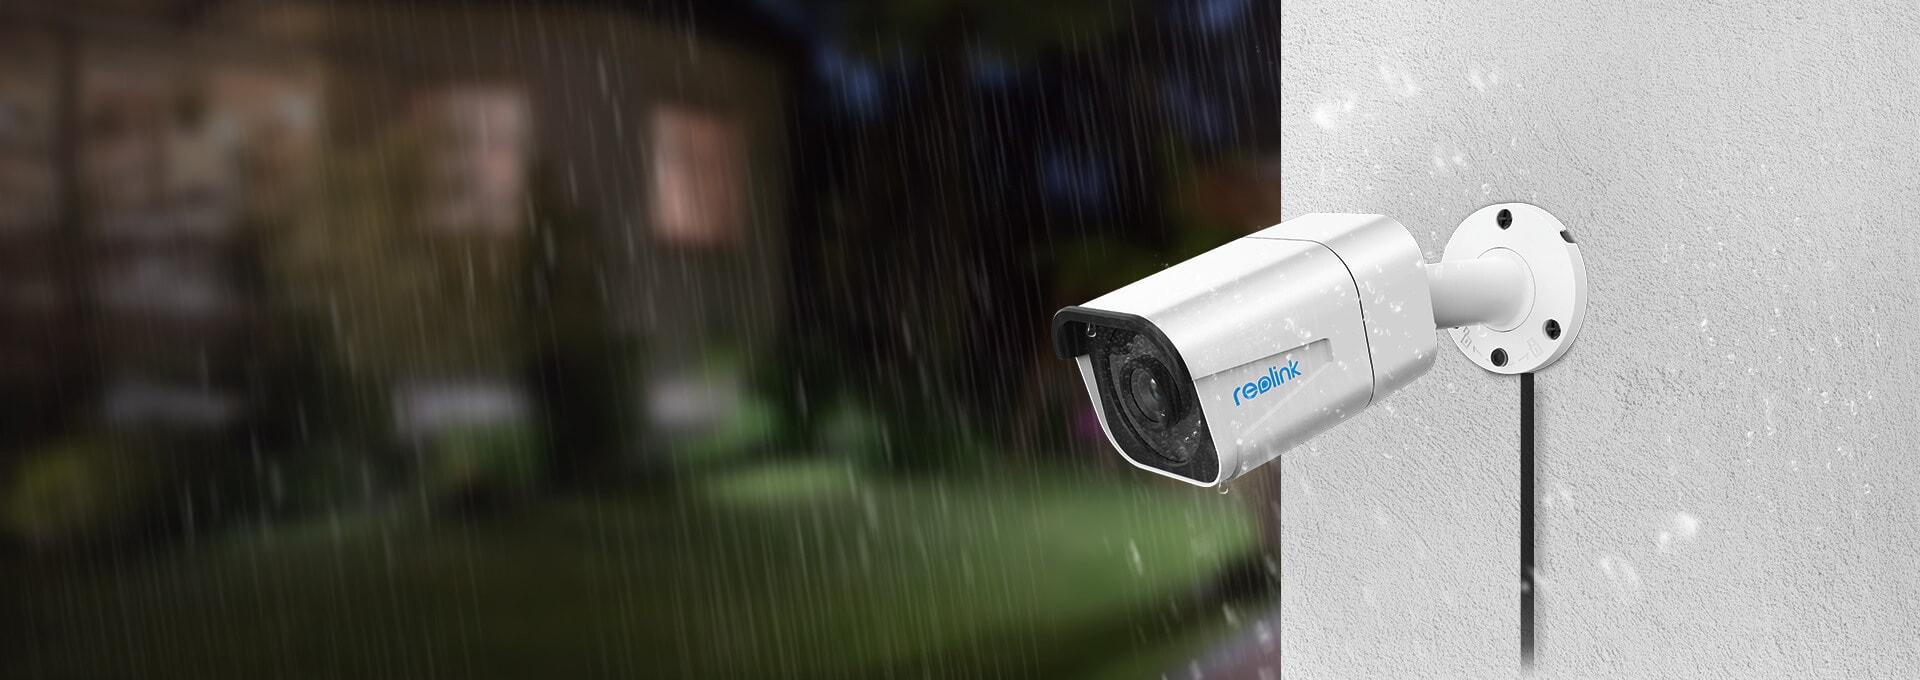 IP66 Weatherproof RLK8-800B4 4K Security Camera System